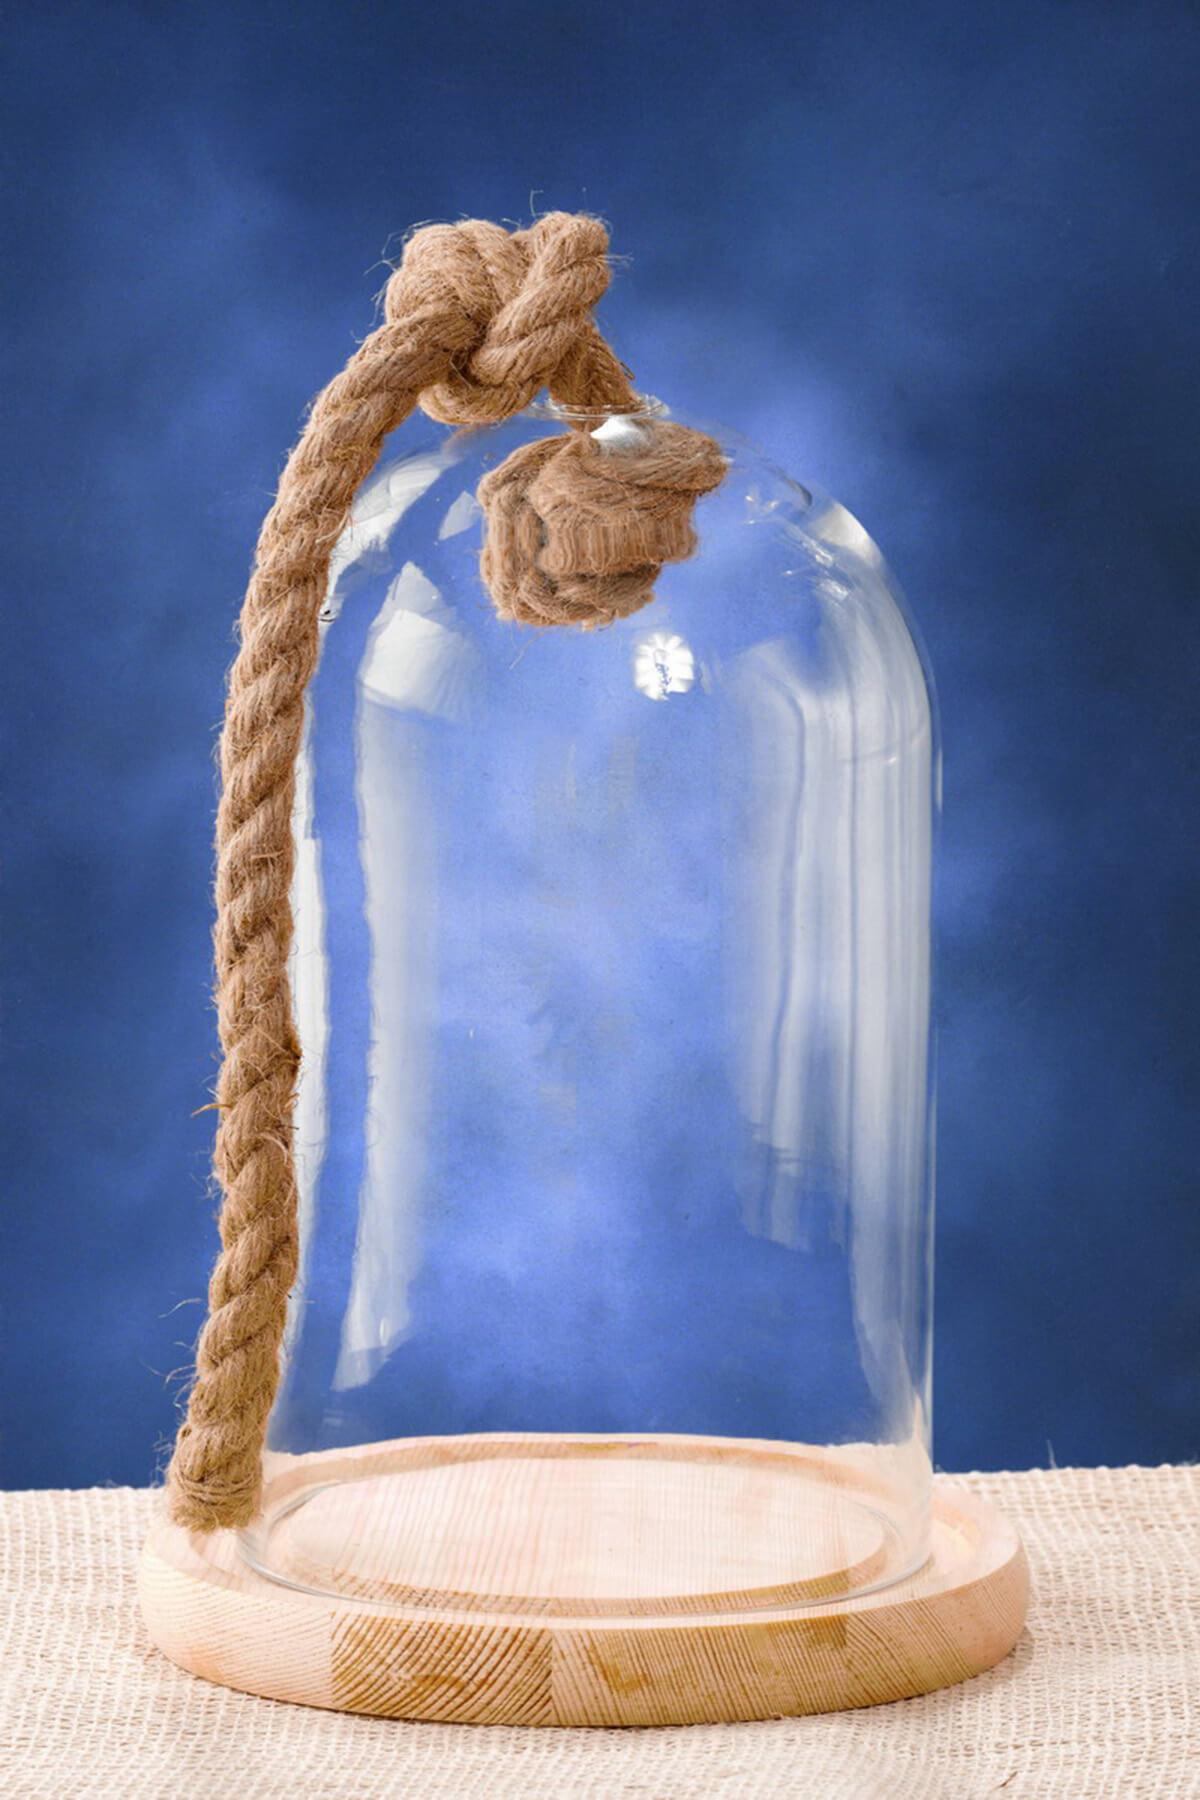 Nautical Glass Bell Jar 9.25 in